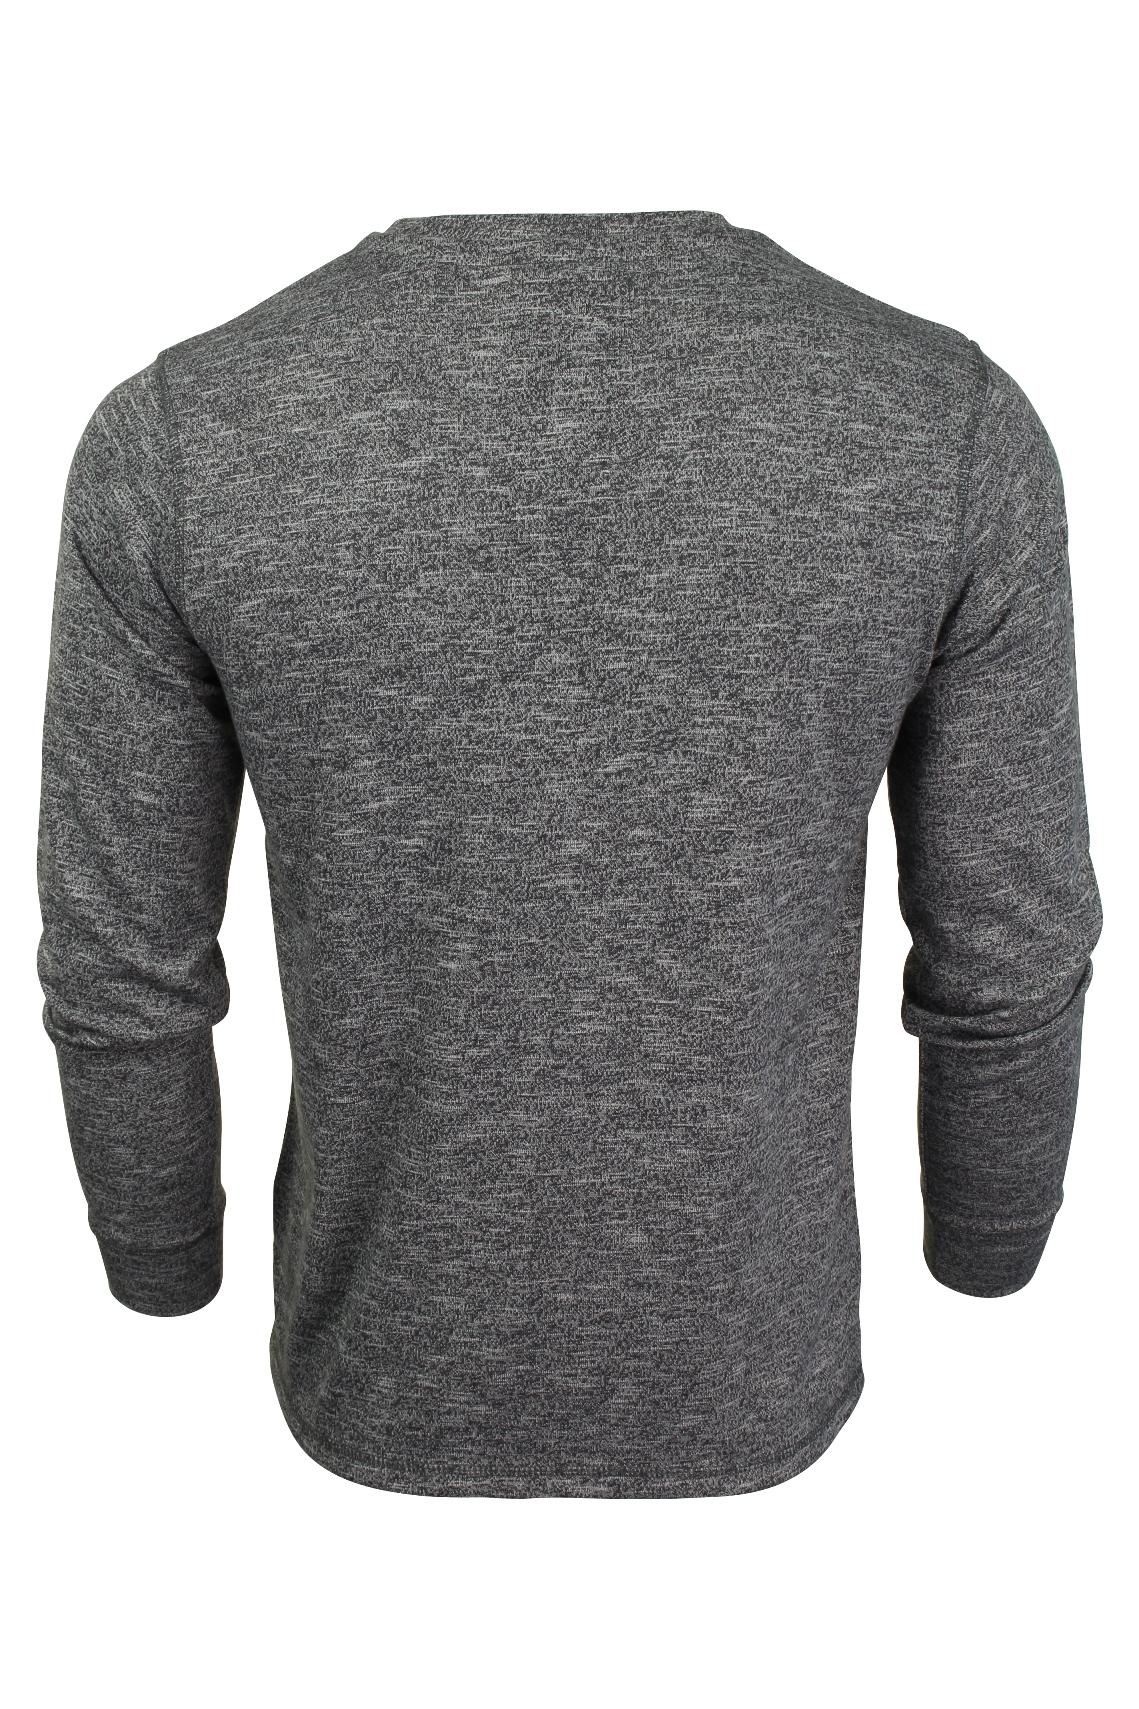 Mens-Top-shirt-by-Tokyo-Laundry-039-Dawsons-Ridge-039-Long-Sleeved thumbnail 5